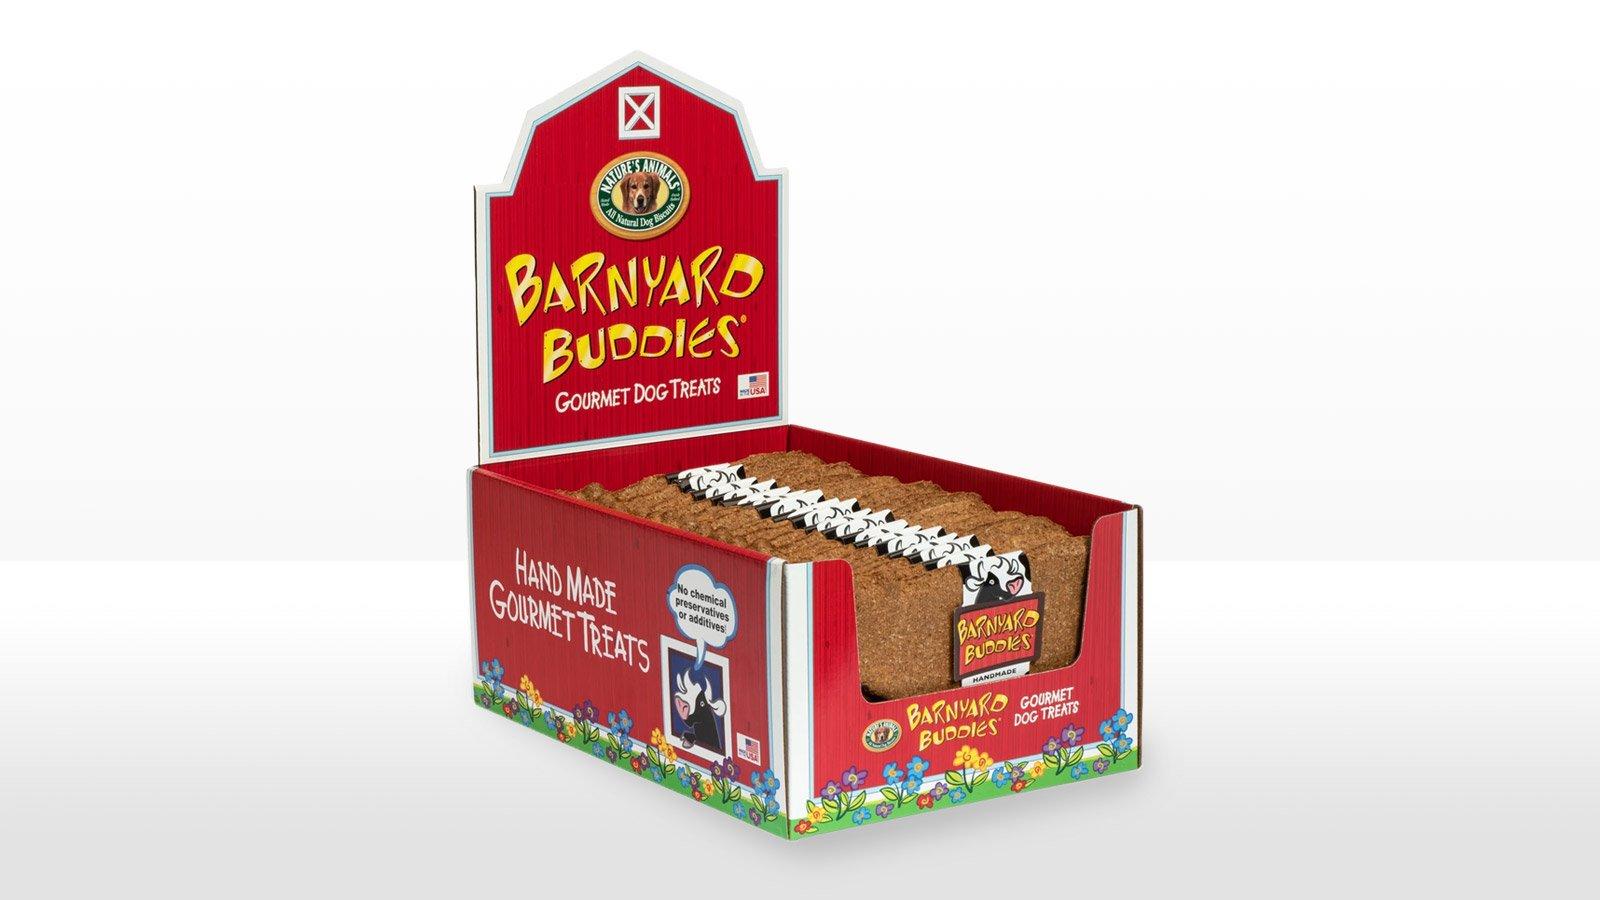 Barnyard Buddies Packaging